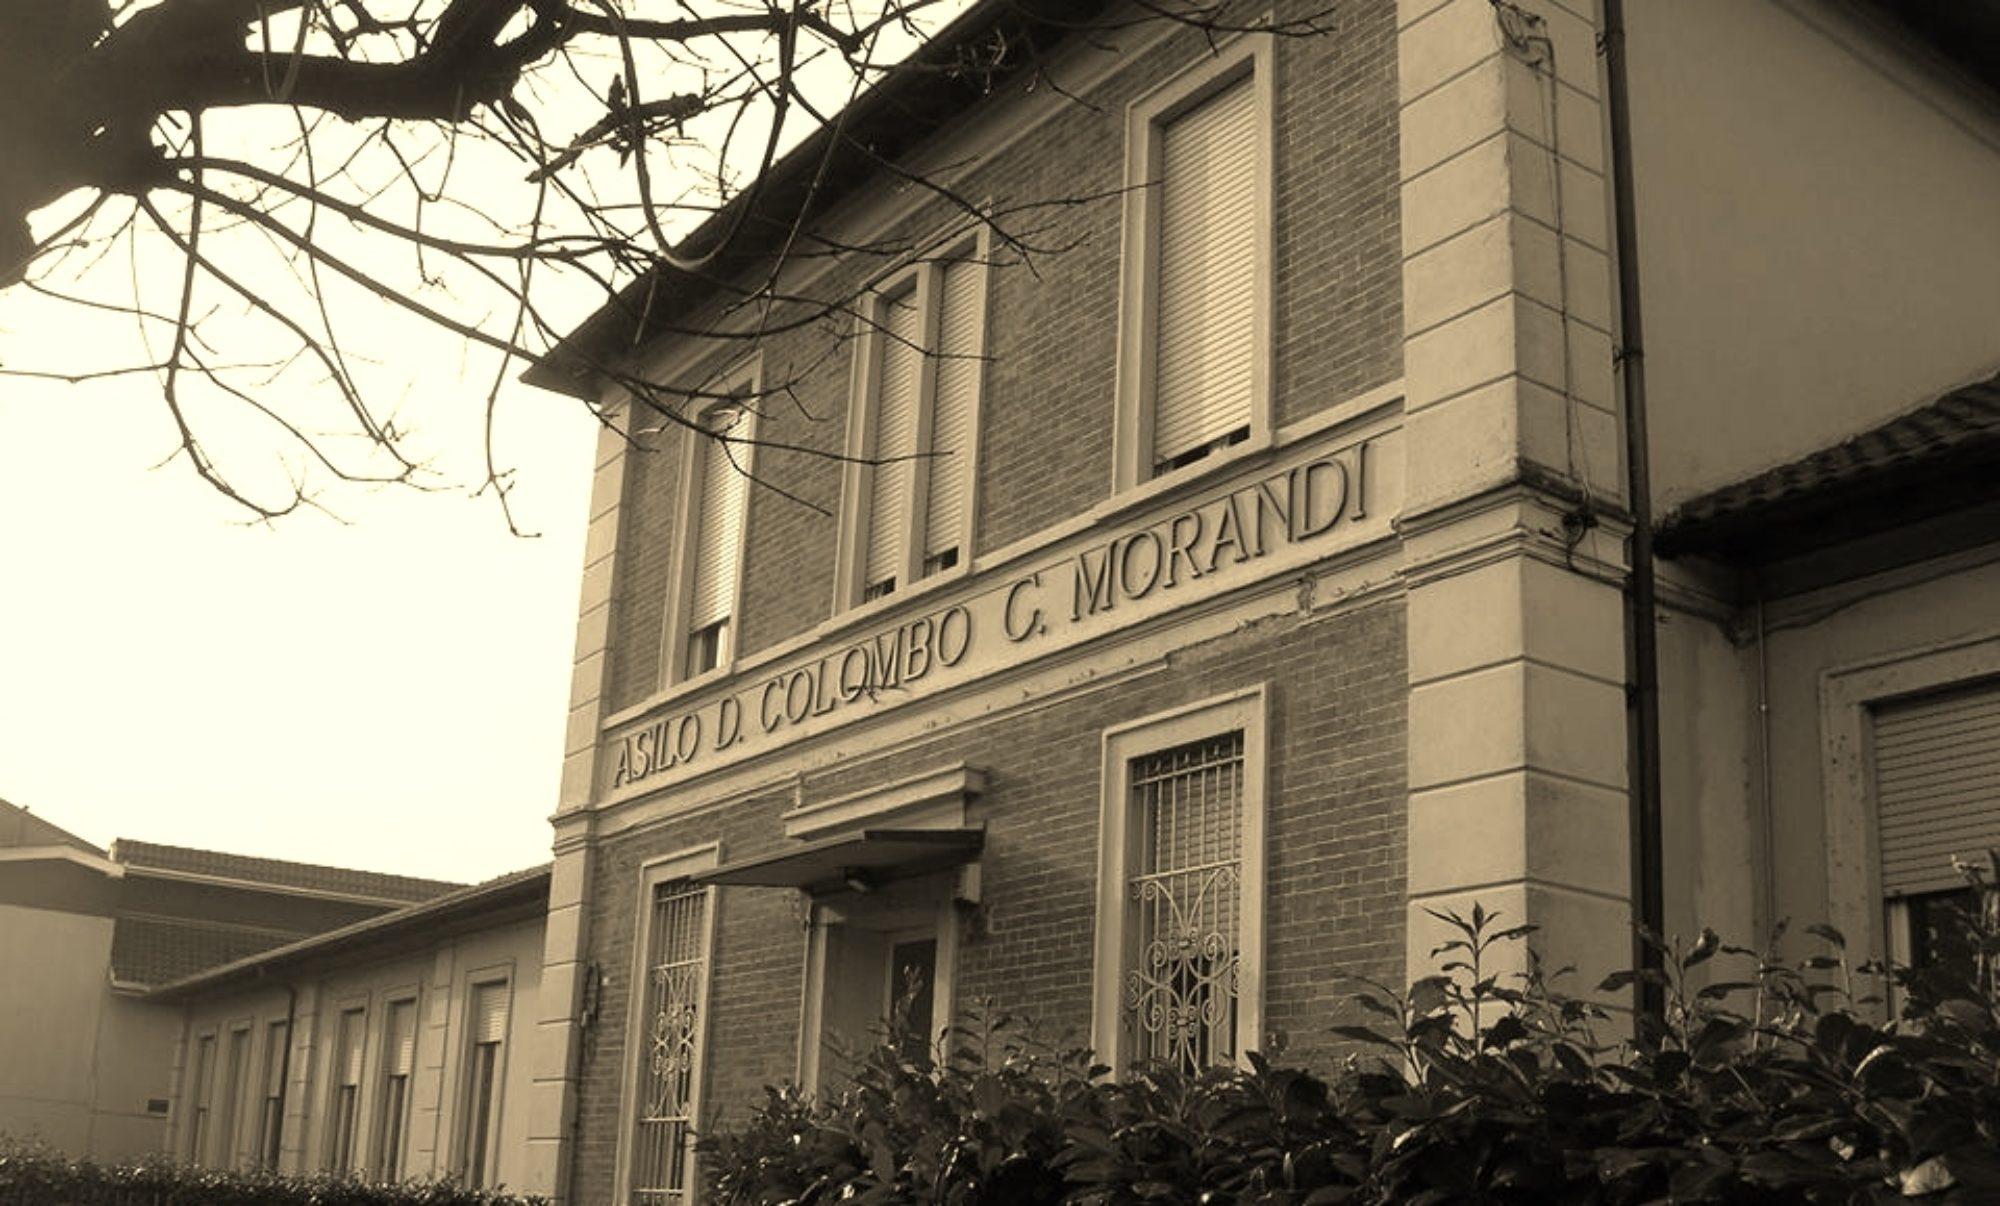 Asilo Infantile D. Colombo G. Morandi